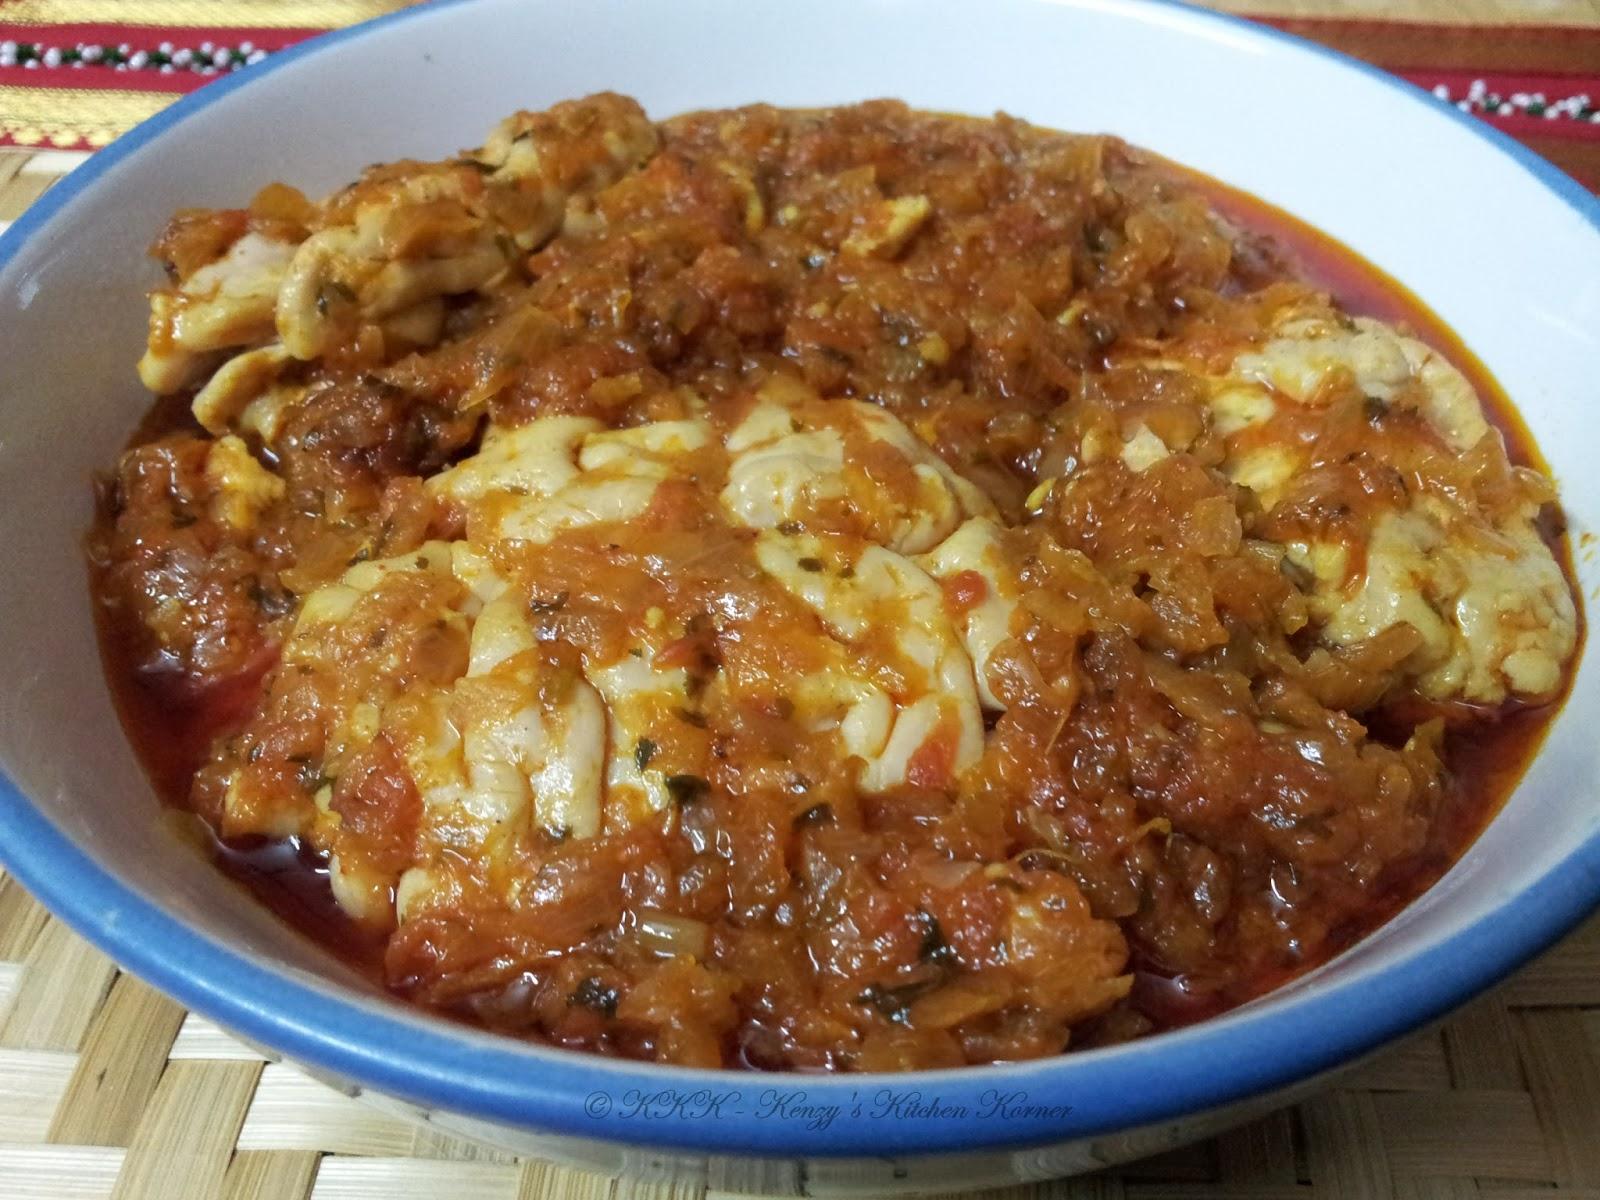 Kharu Bheju Brains In Onions Masala